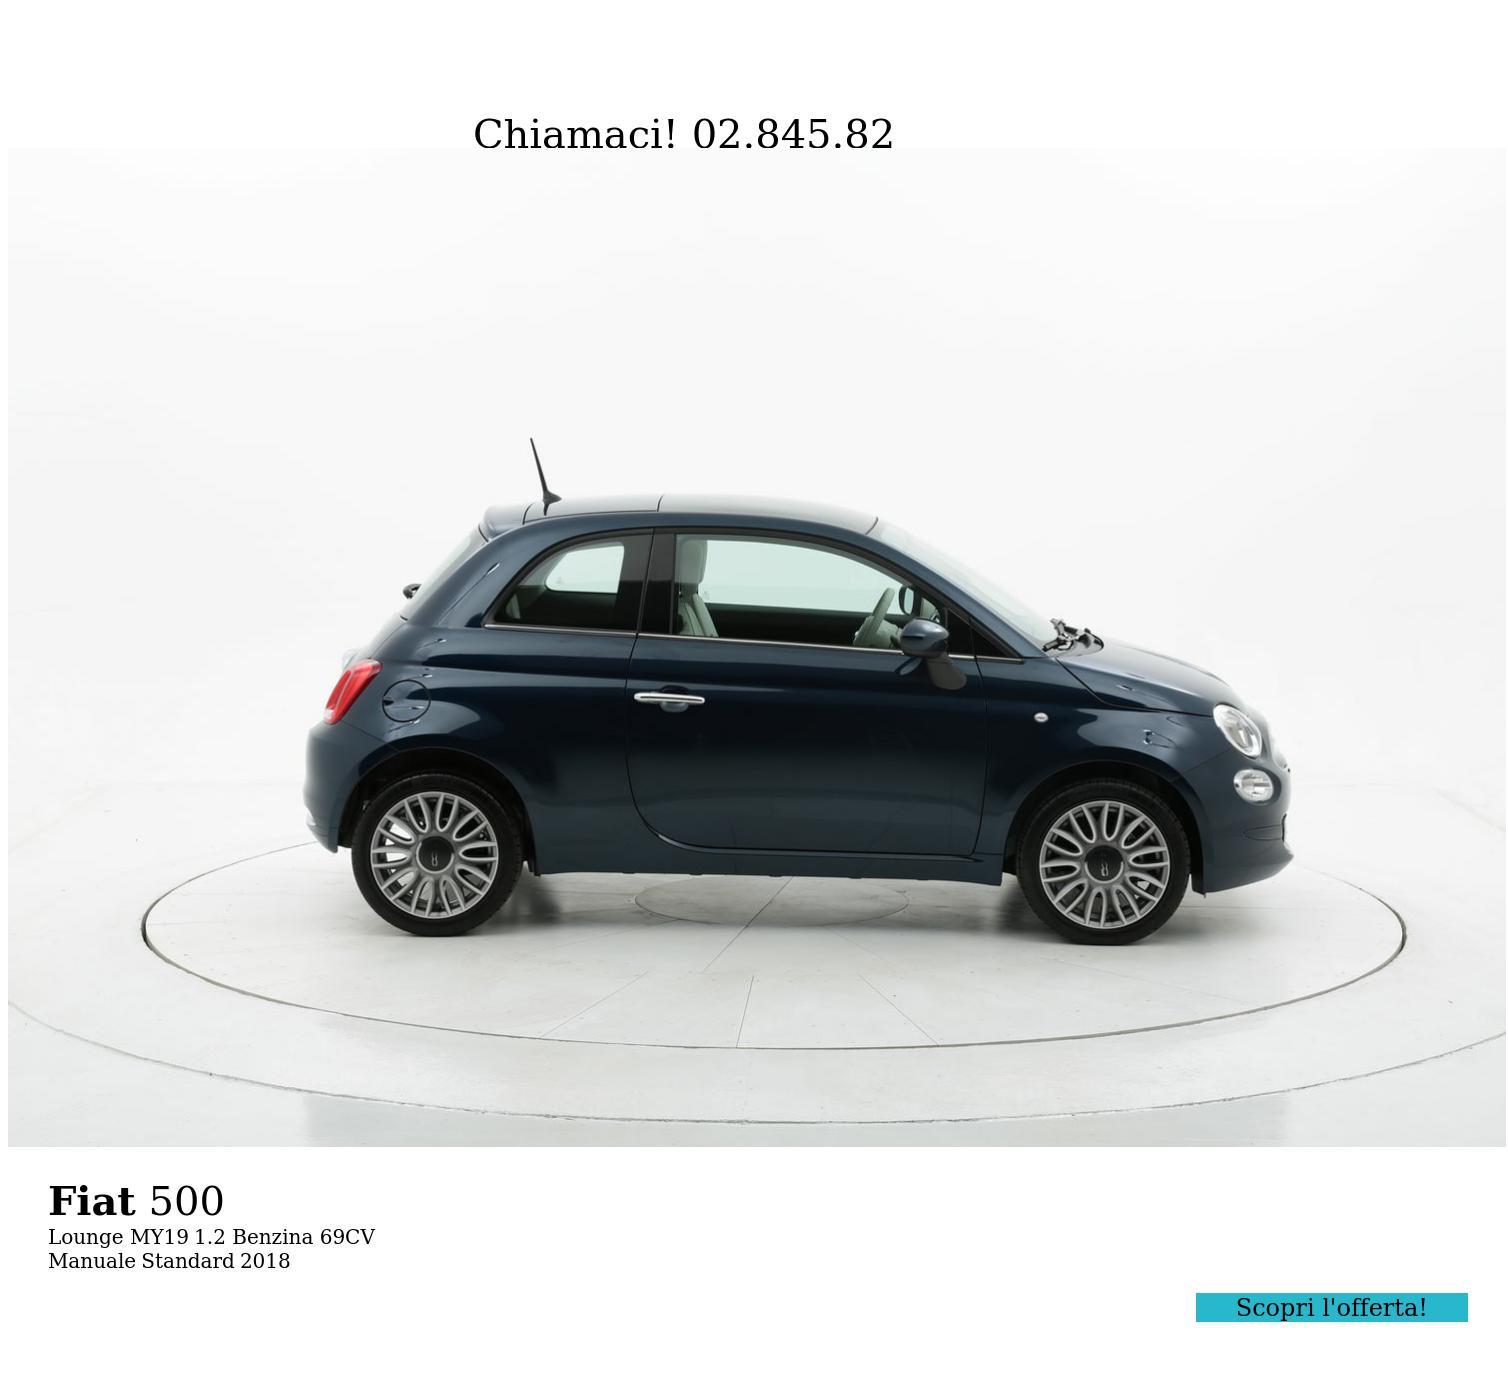 Fiat 500 Lounge MY19 km 0 benzina blu   brumbrum